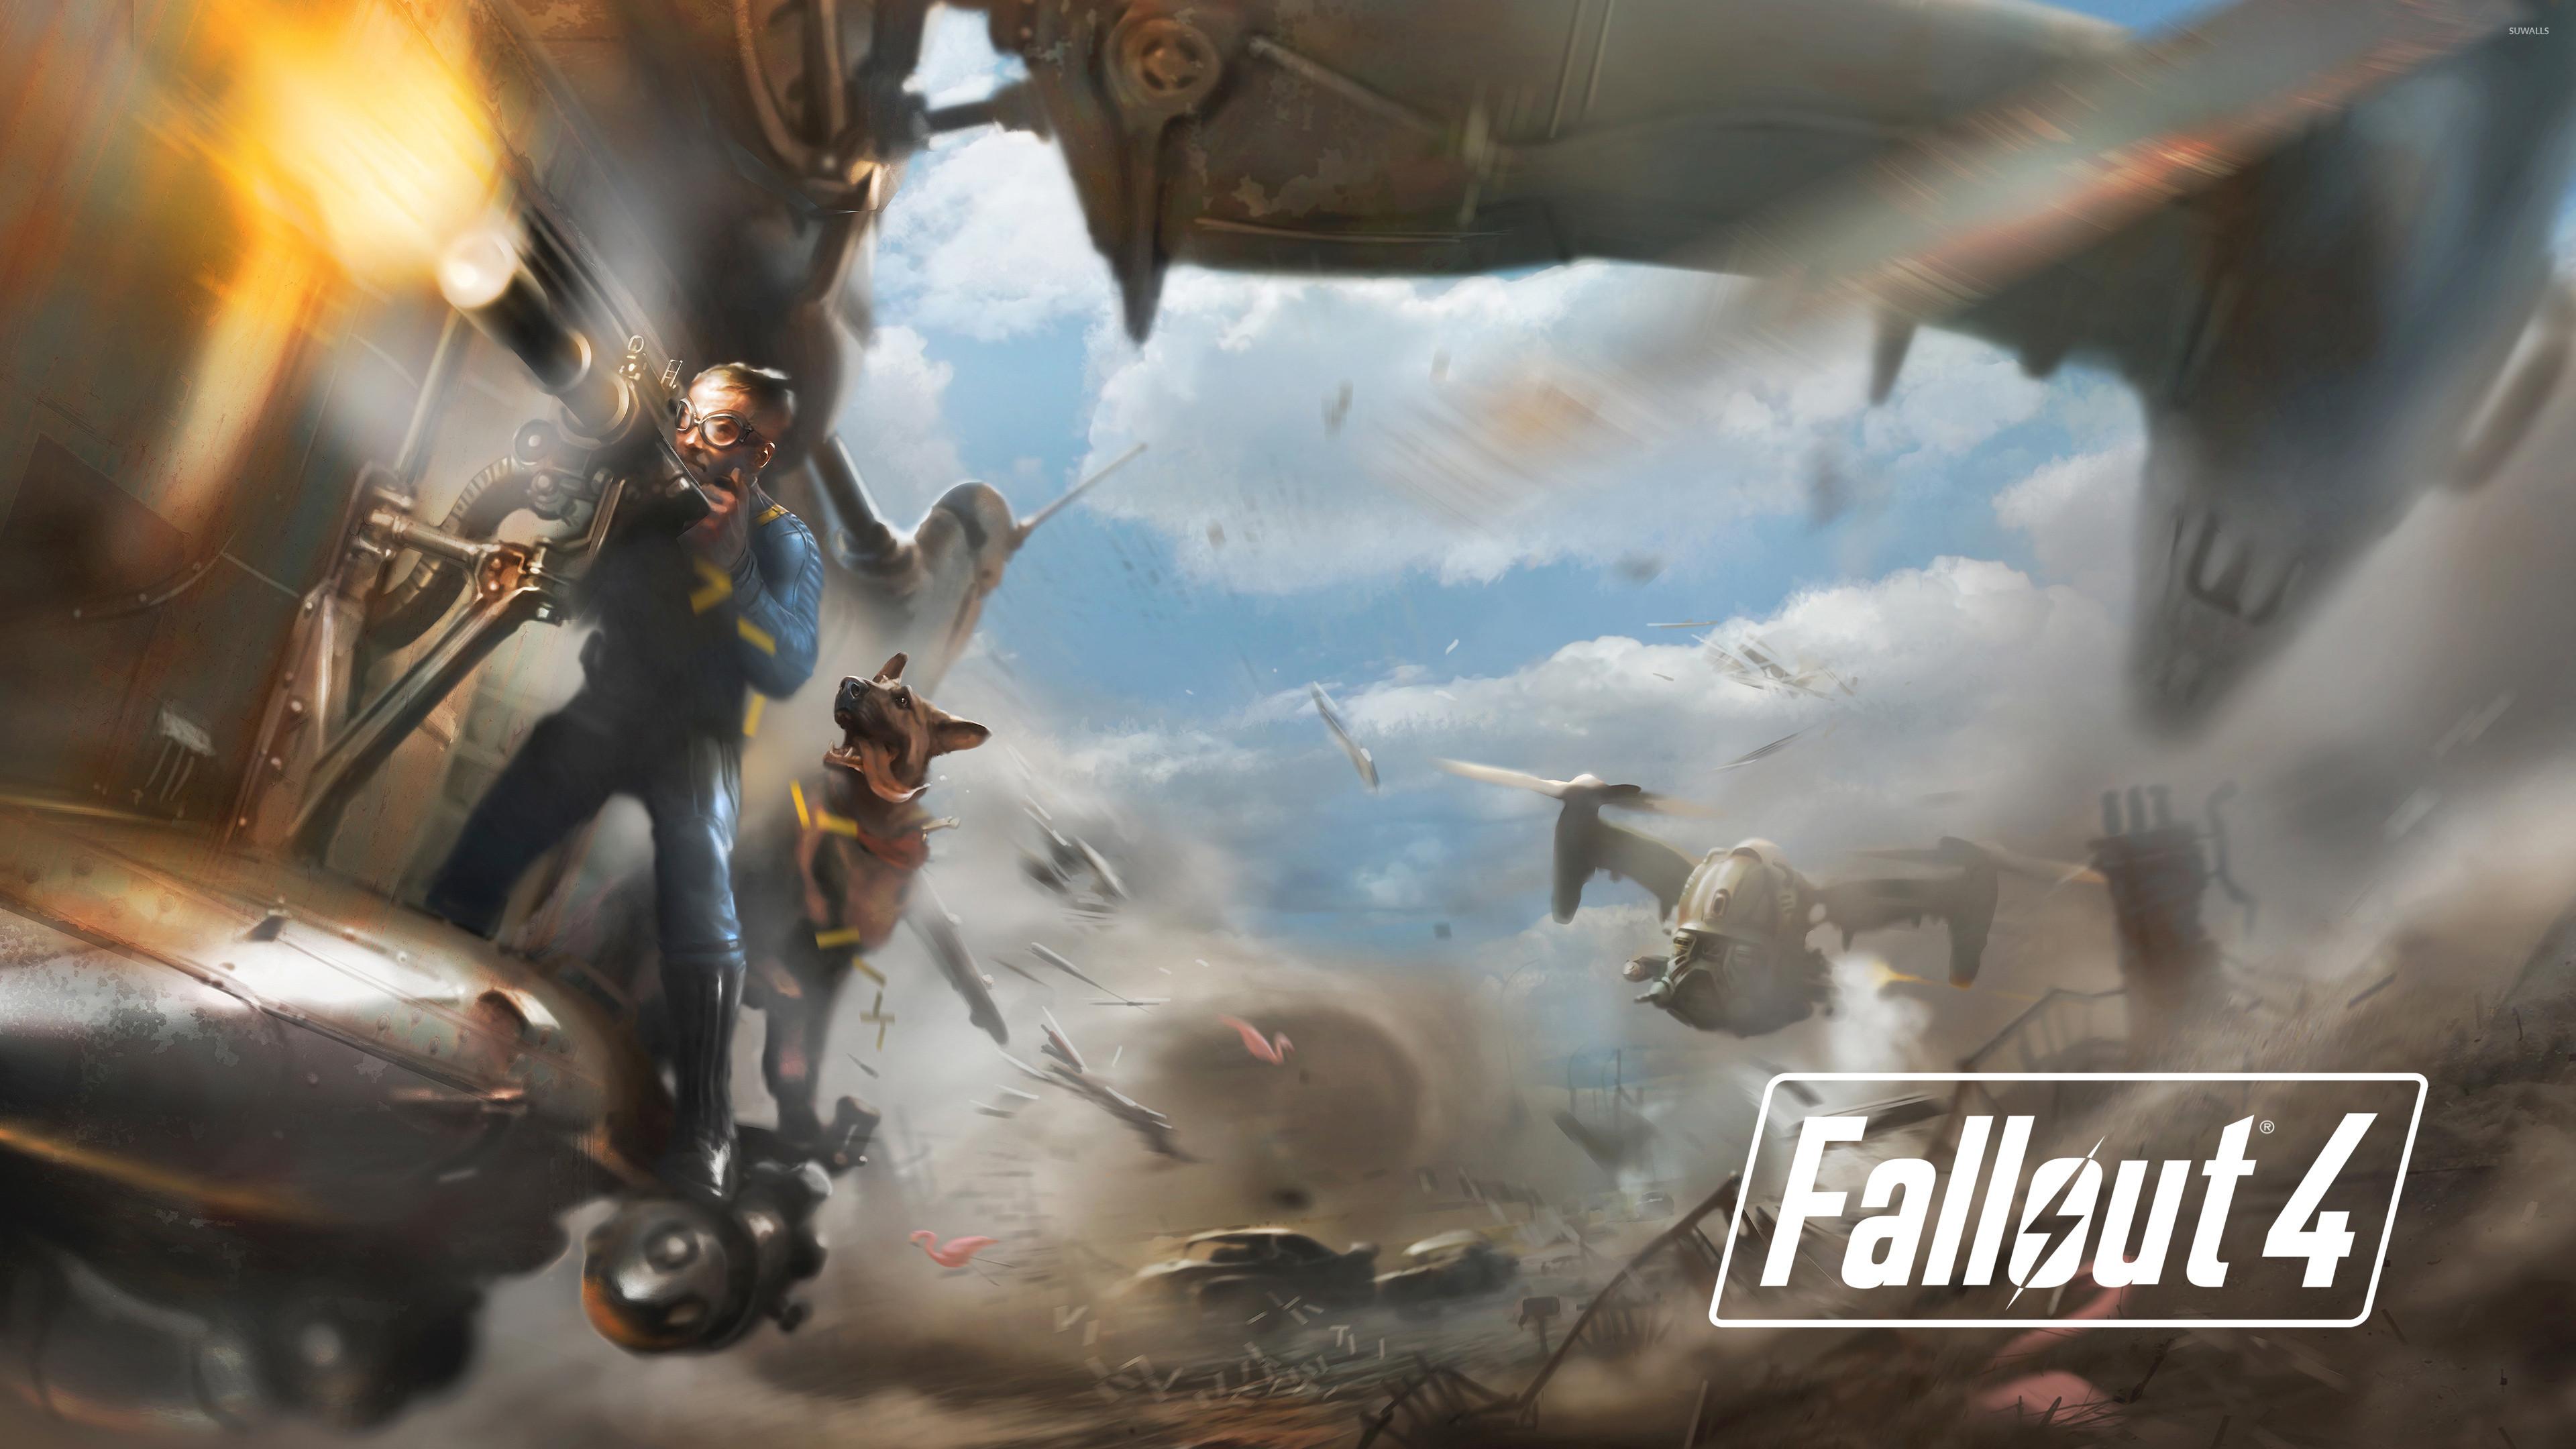 Fallout New Vegas Backgrounds – WallpaperSafari